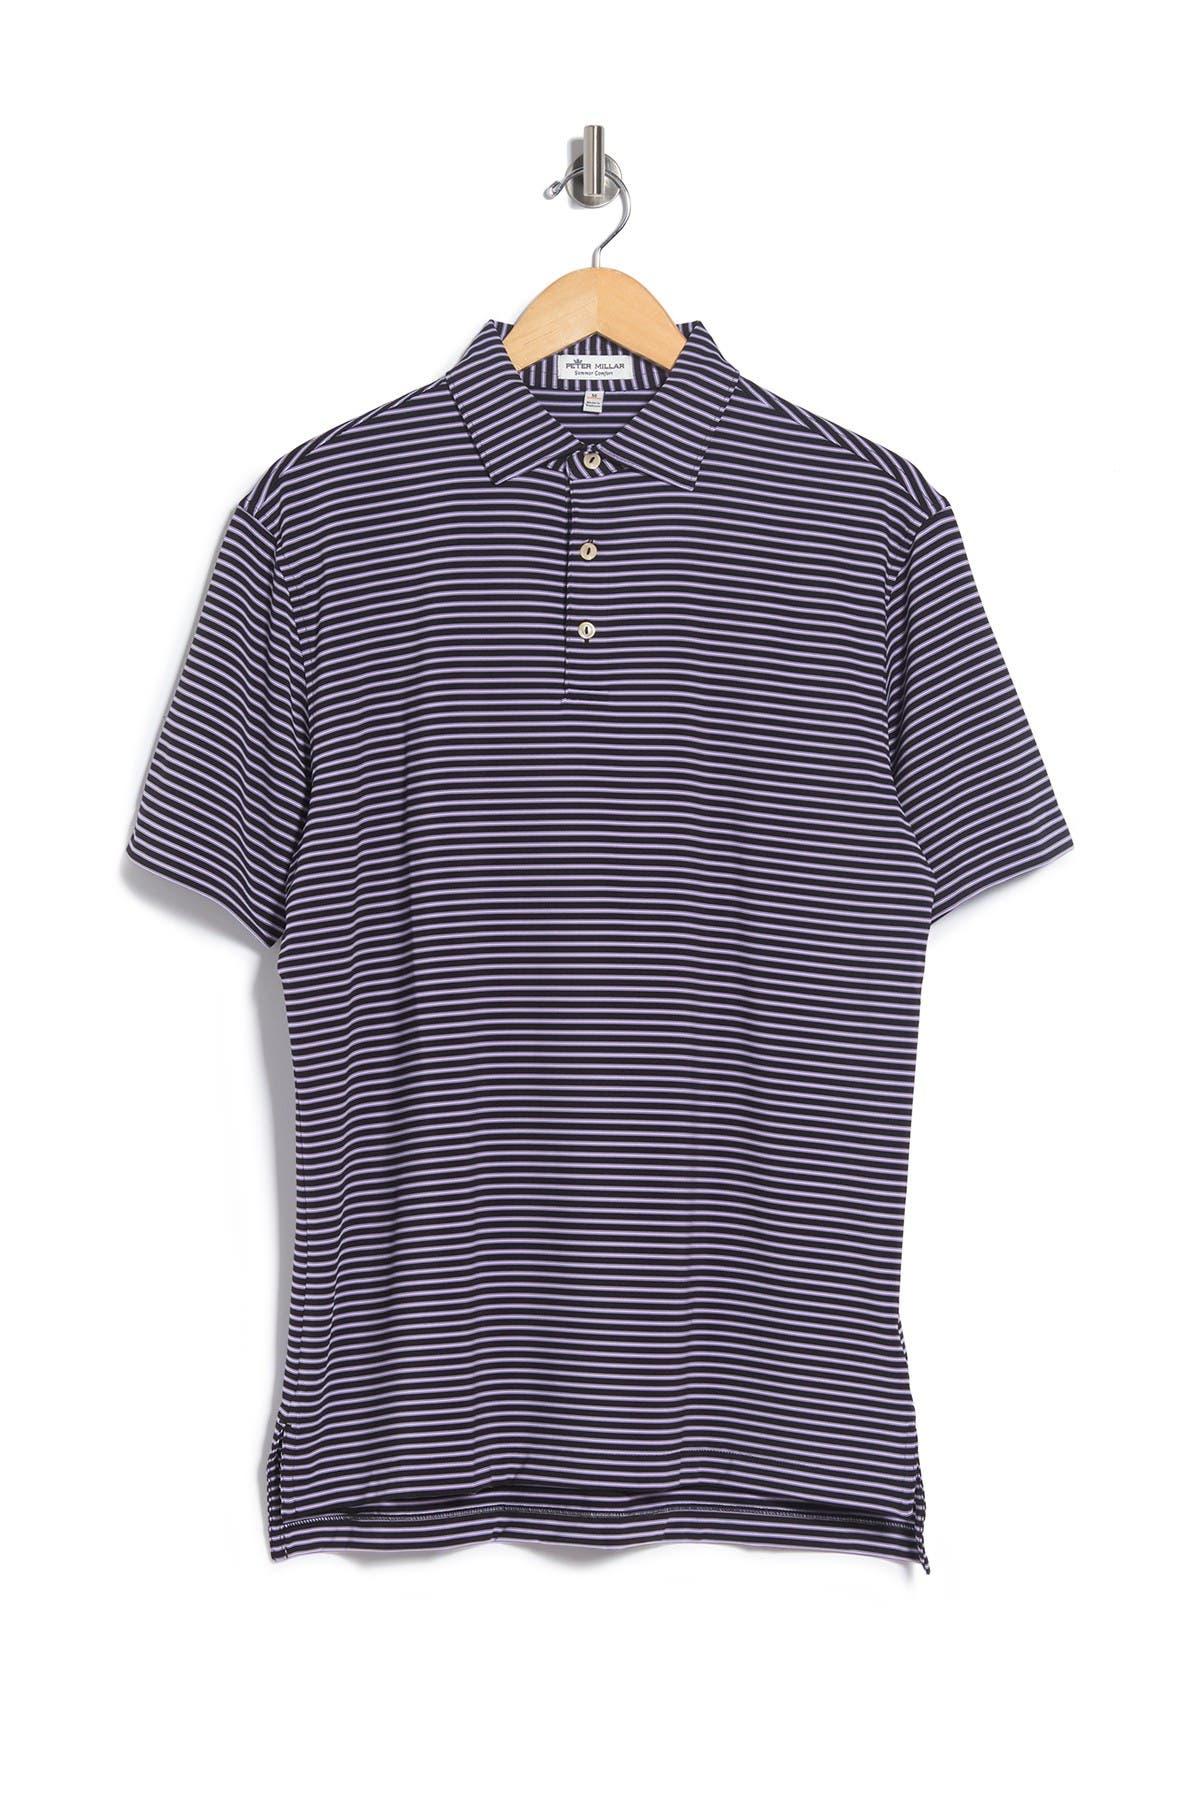 Image of Peter Millar Joyce Stripe Polo Shirt